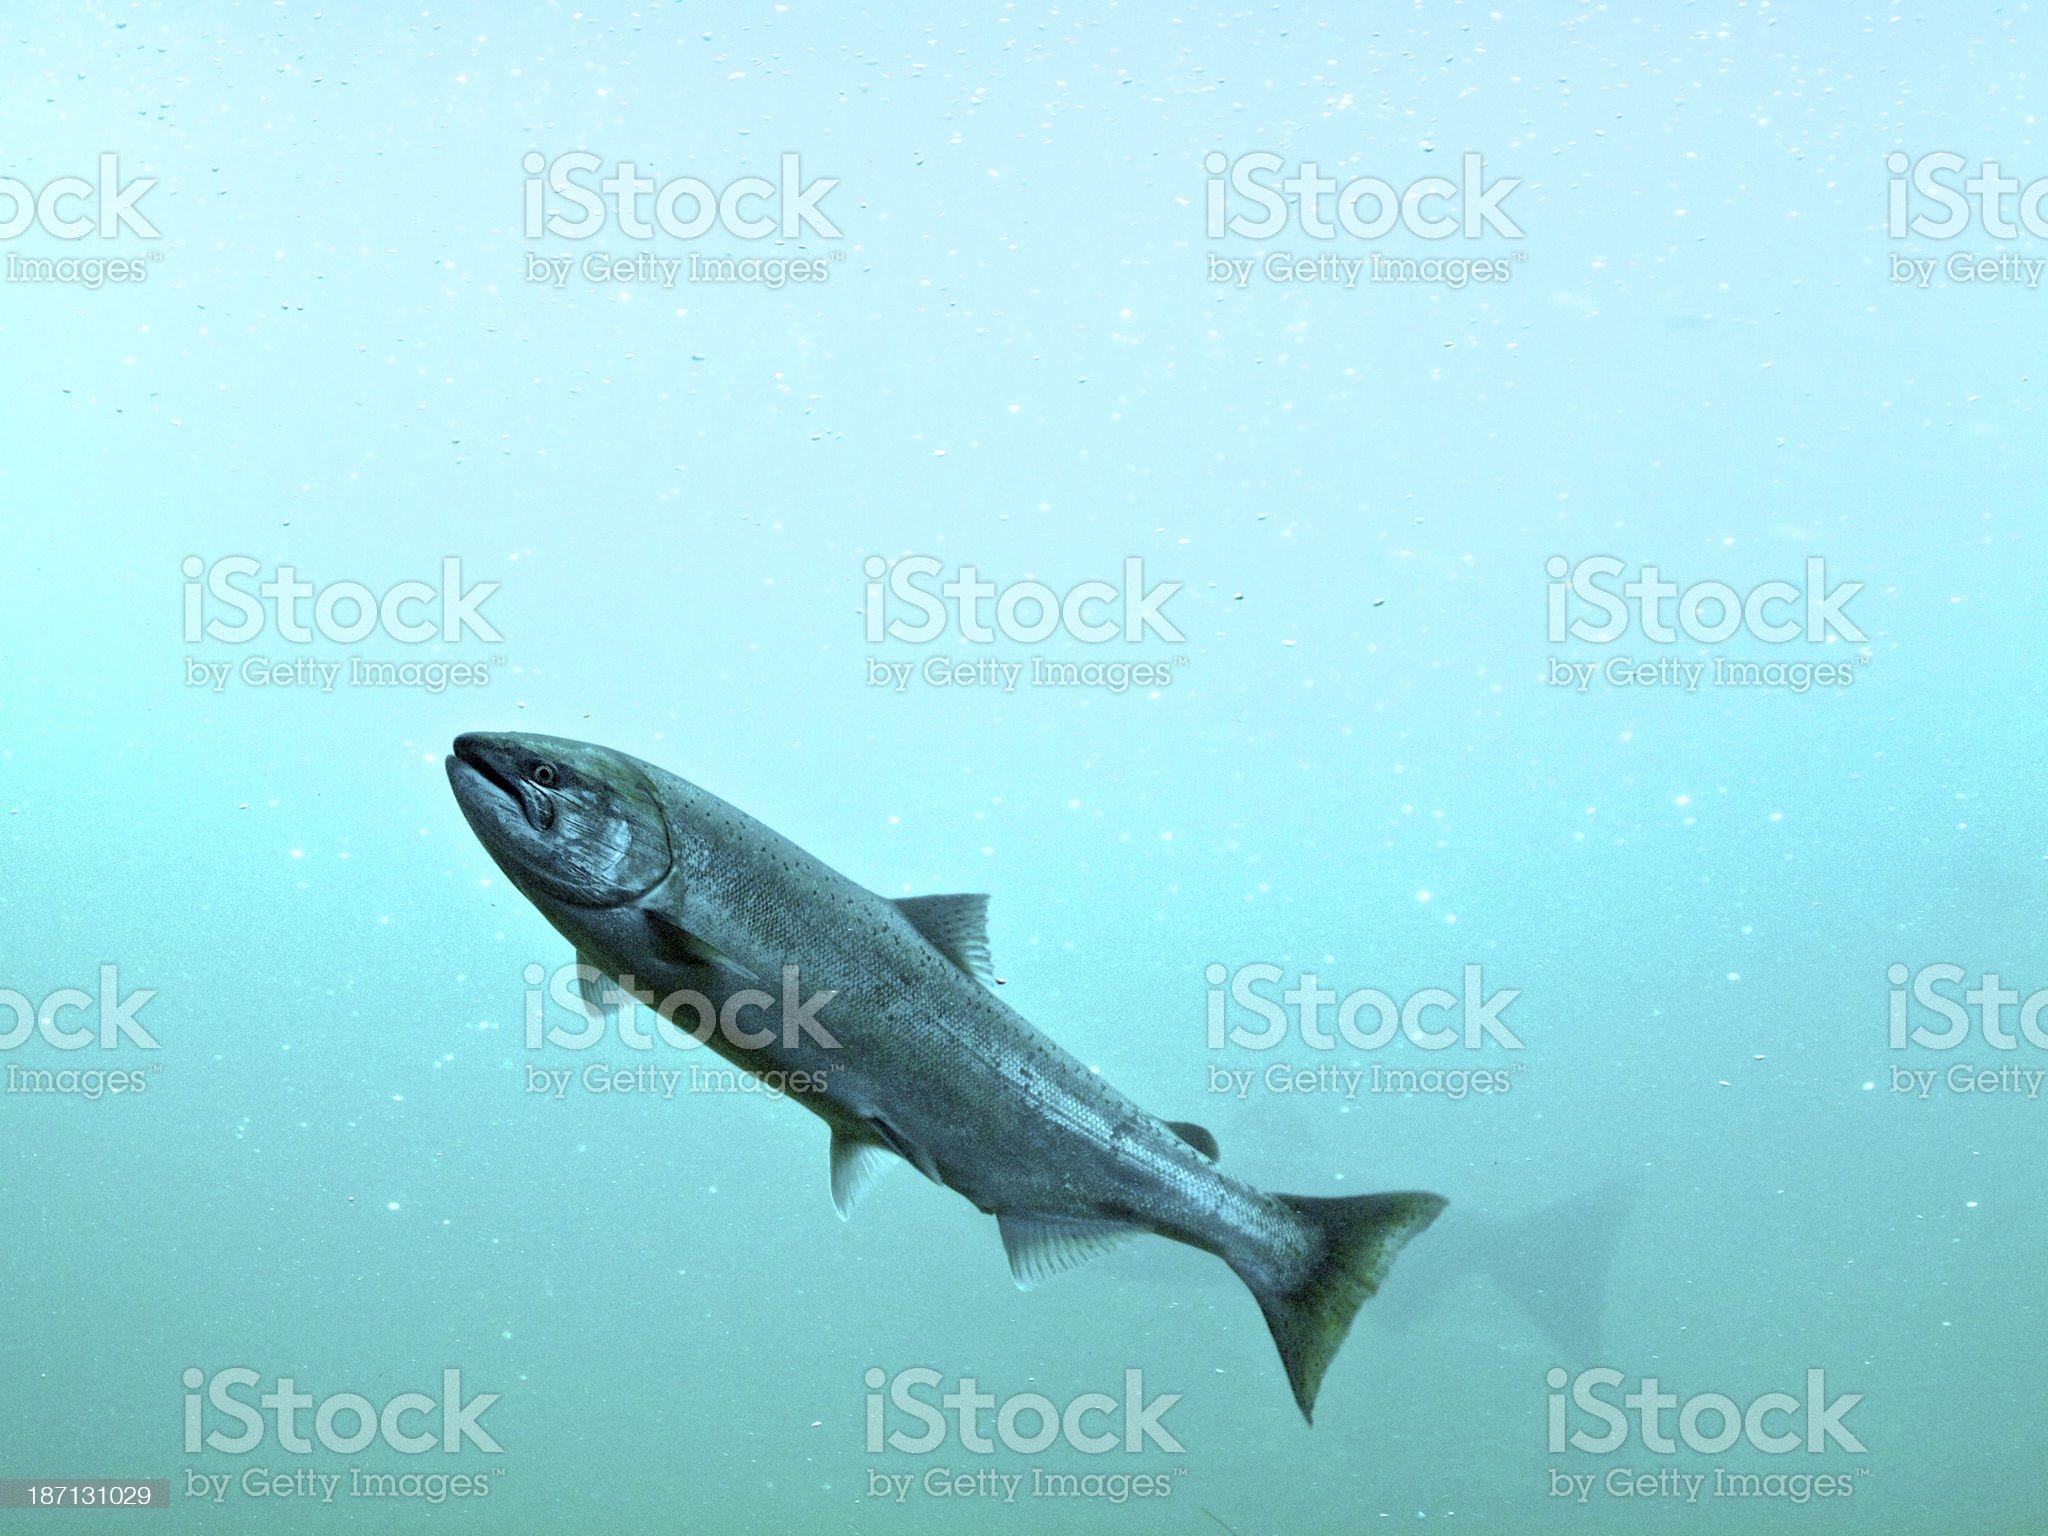 Steelhead Trout Swimming in Blue Light Water royalty-free stock photo